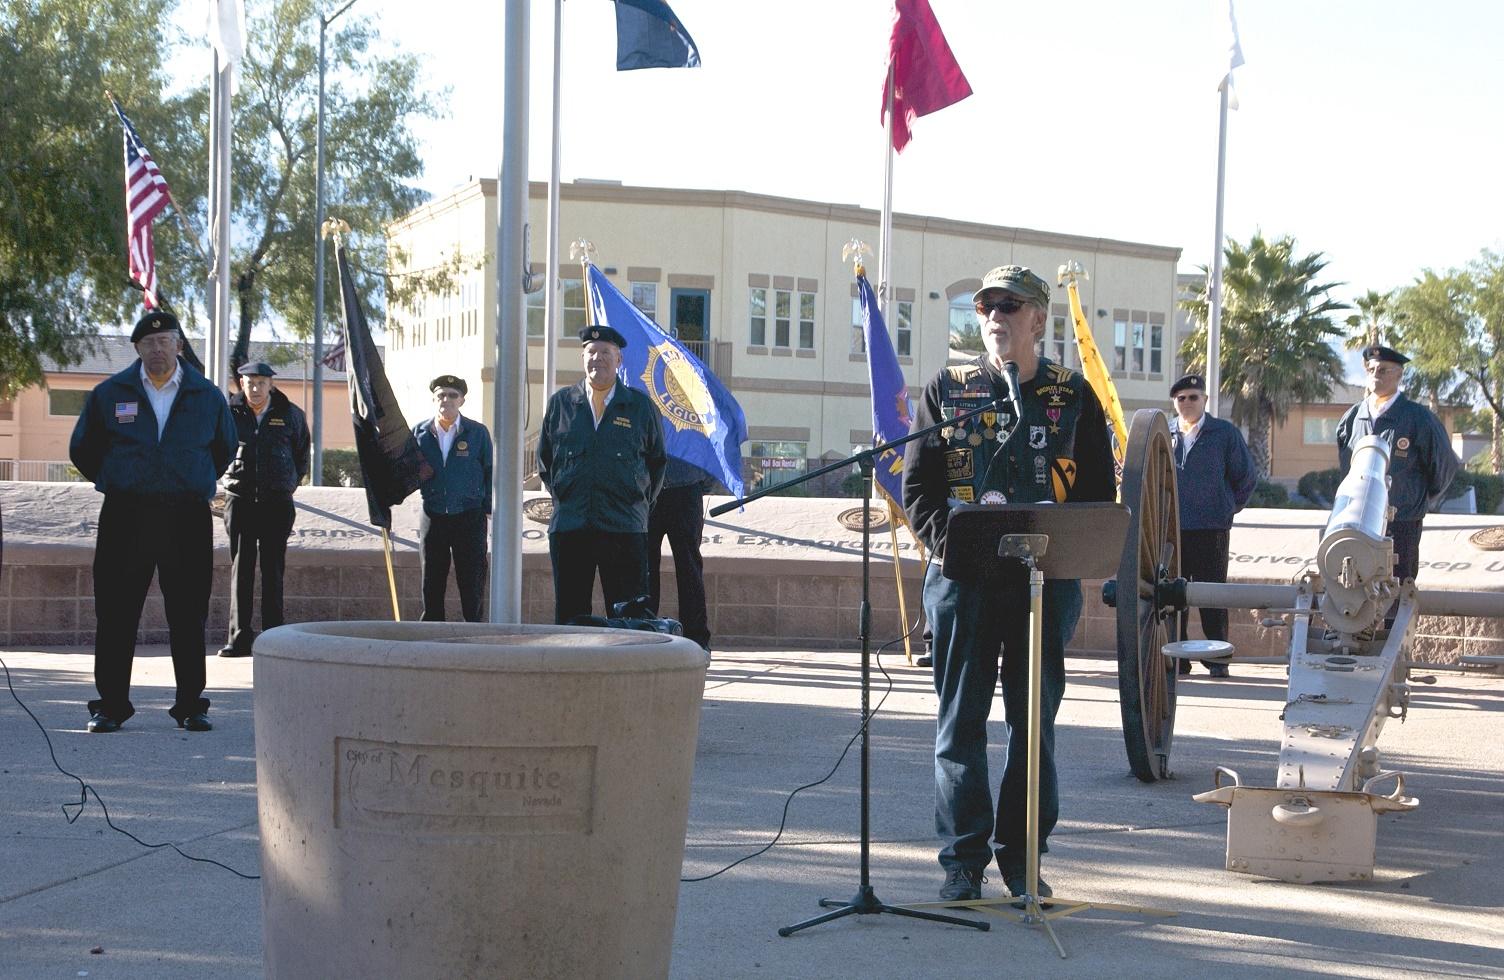 Veterans Honored in Mesquite Ceremony